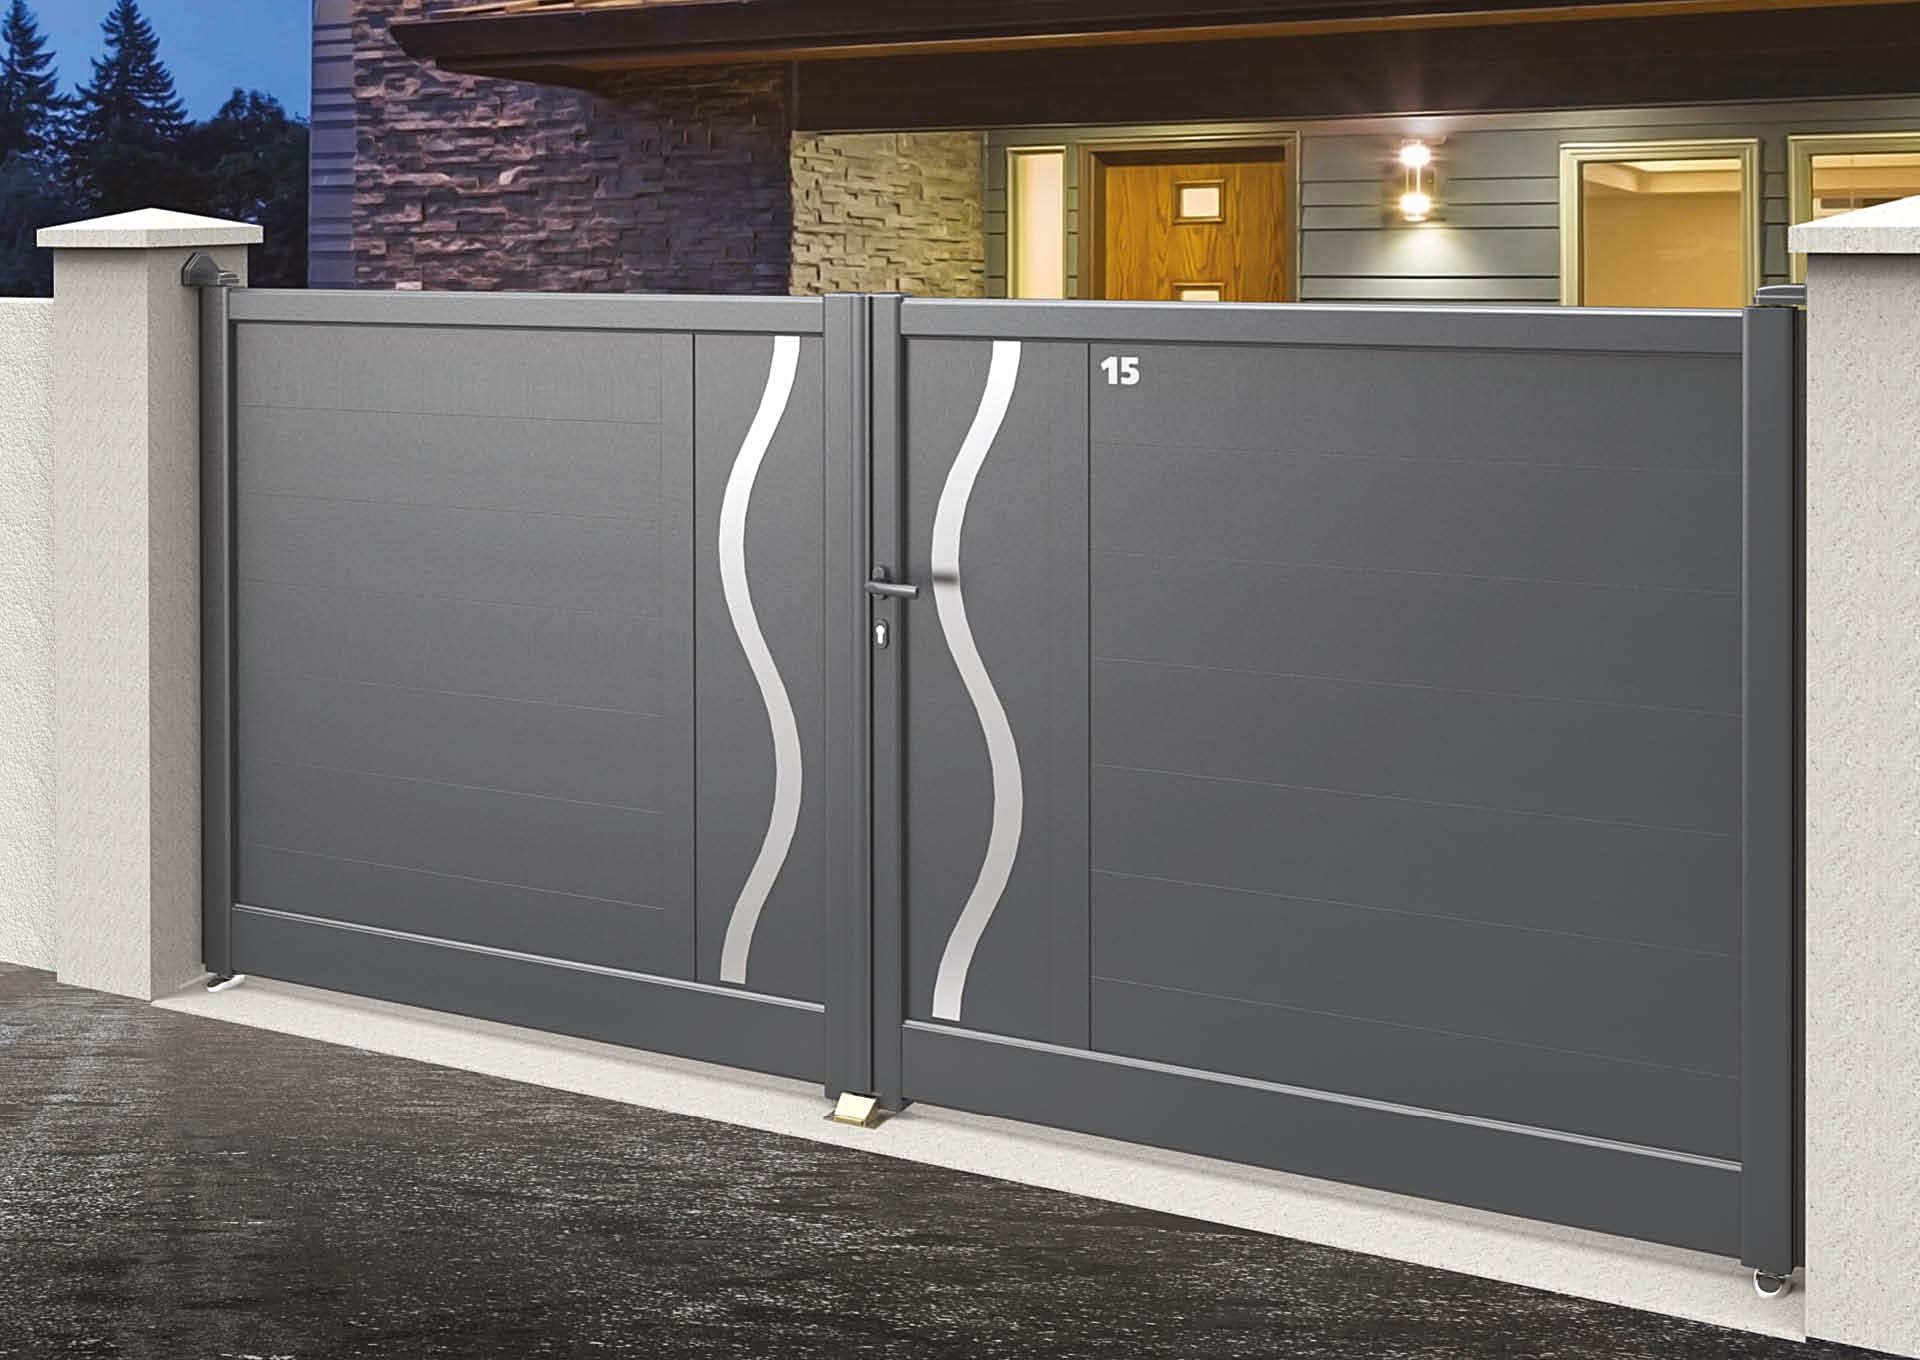 Portail battant en aluminium 9104_B_P2DA Lames horizontales 200mm + décor alu brossé Ondulation